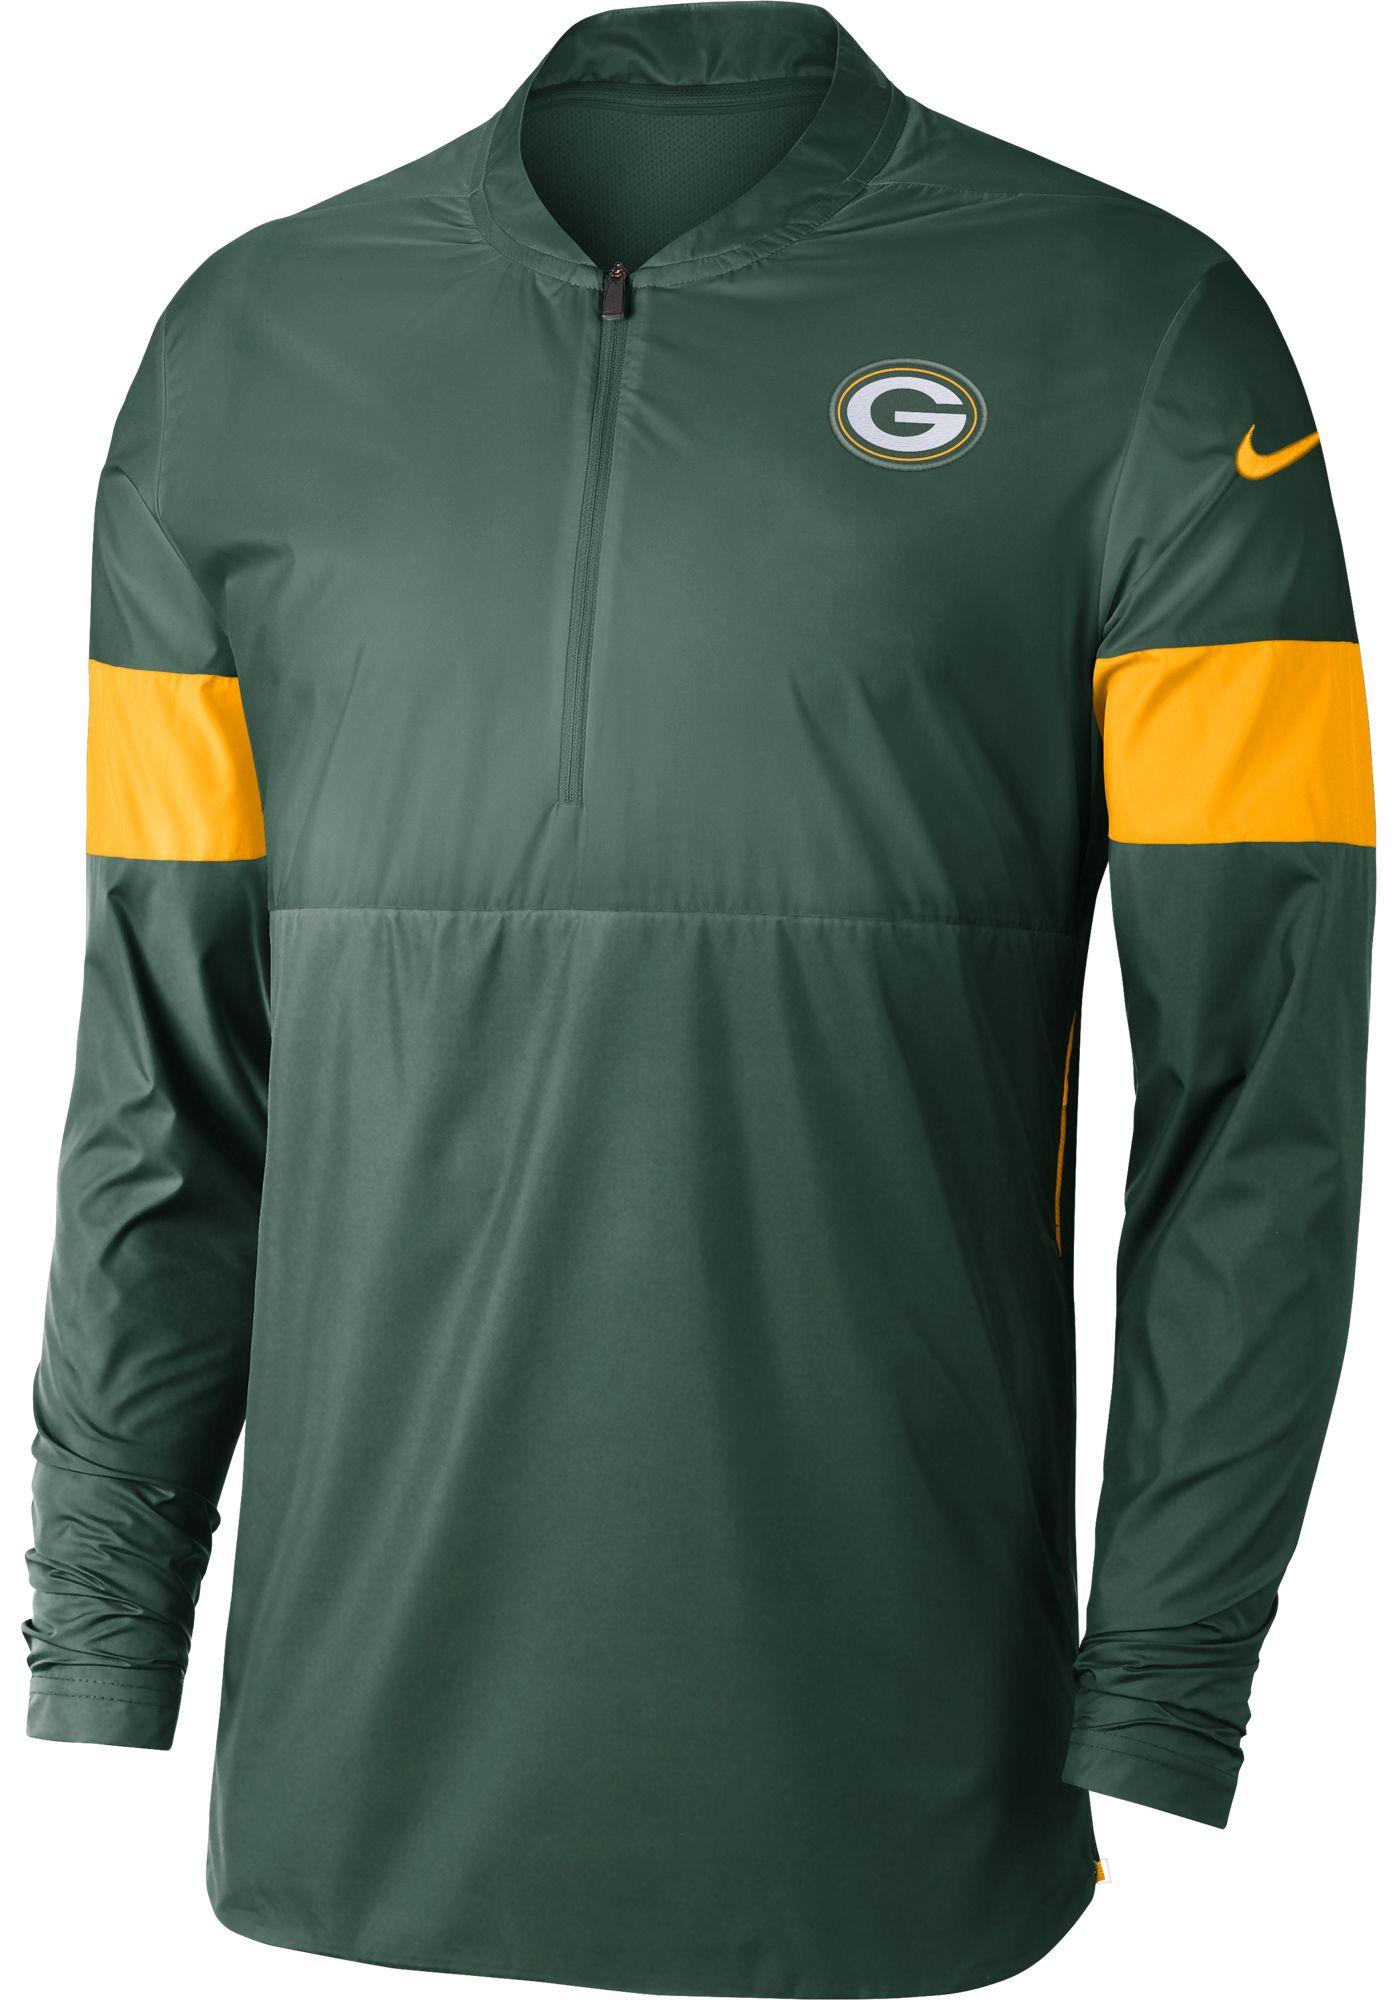 Nike Men's Green Bay Packers Sideline Coach Green Half-Zip Performance Jacket